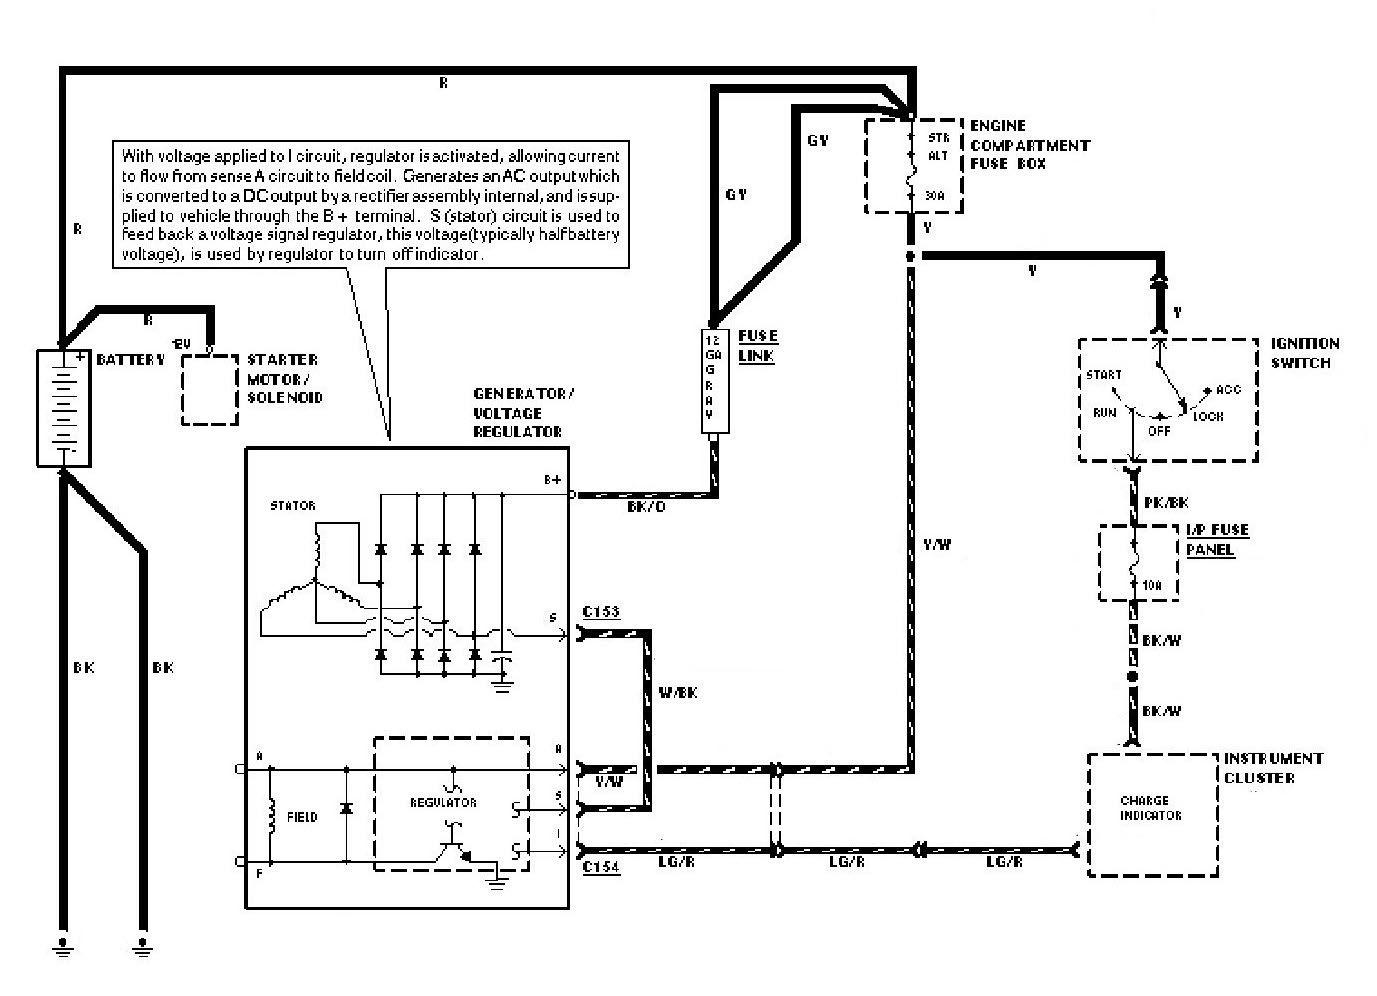 Alternator Wiring Diagram External Regulator 1968 Vw Type 1 Internal